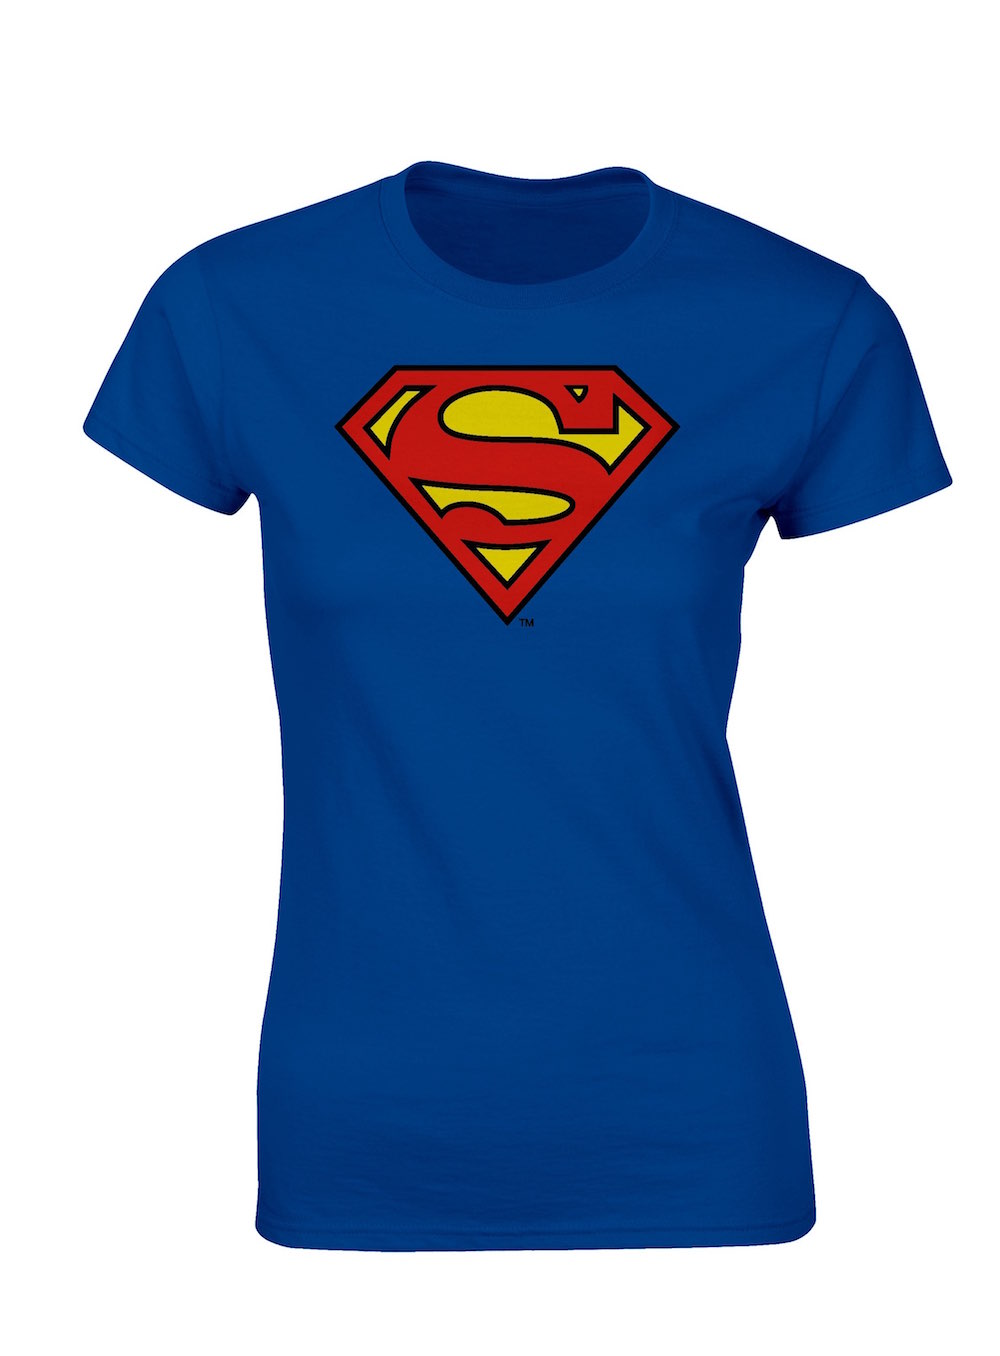 LOGO SUPERMAN CAMISETA AZUL CHICA T-S DC COMICS